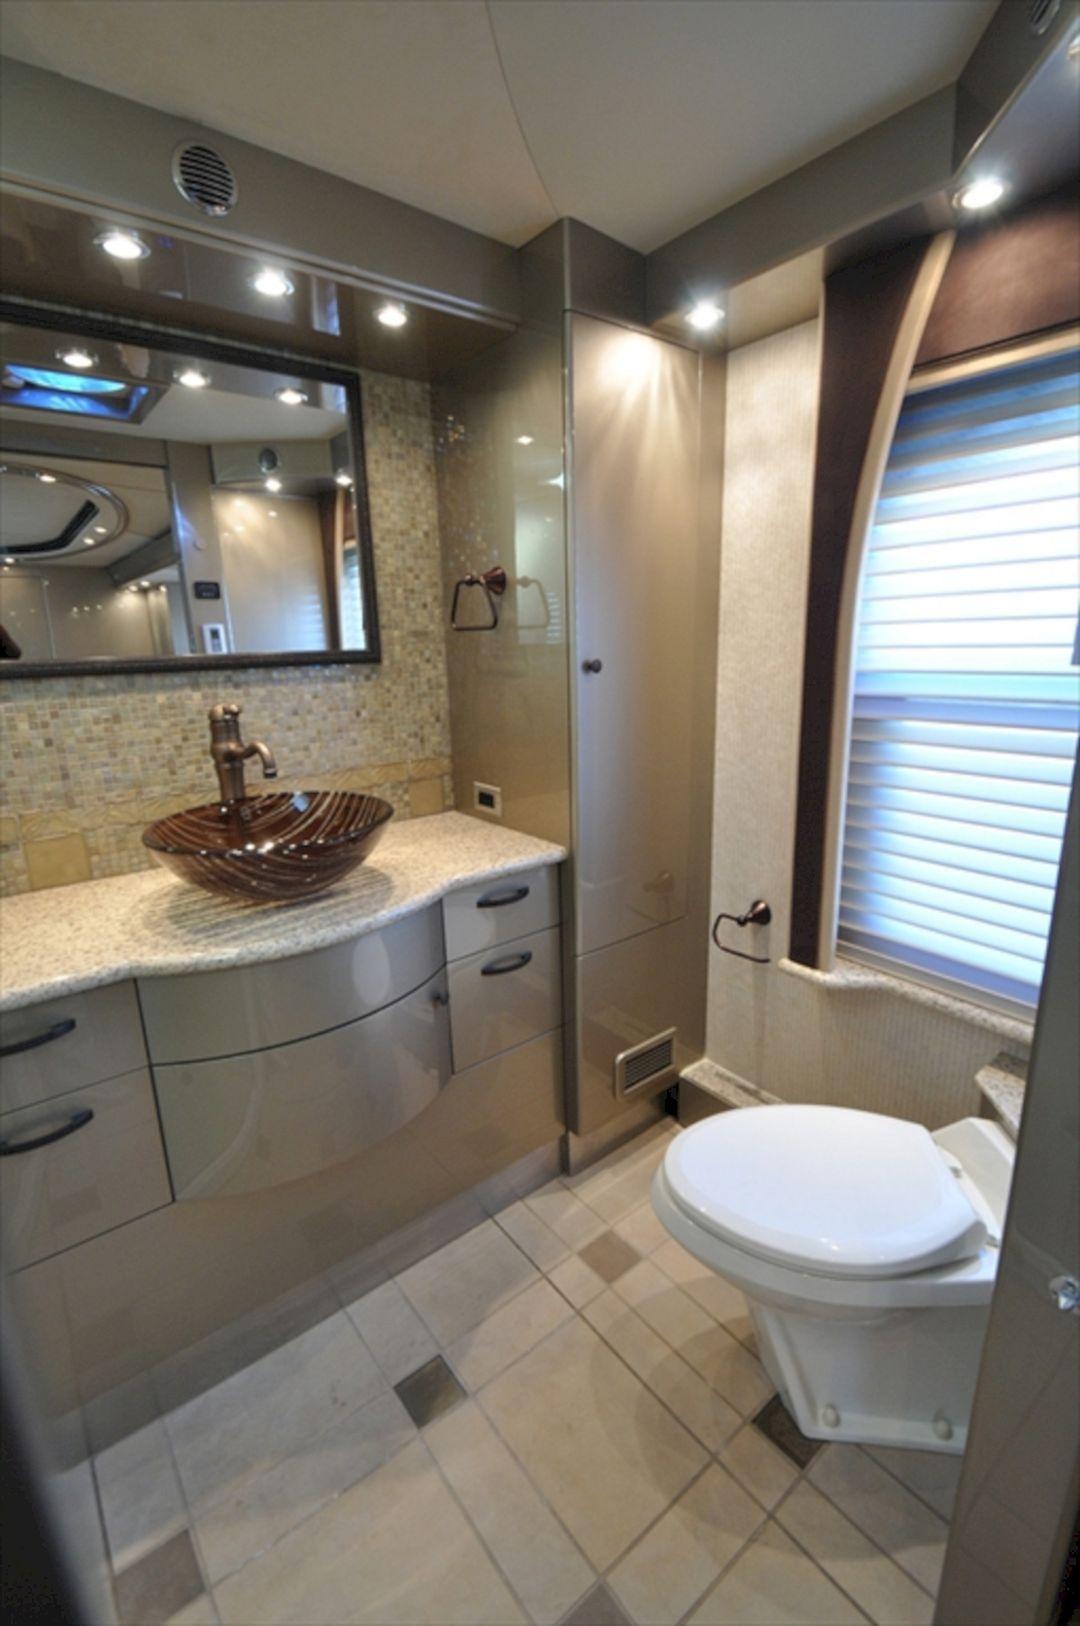 Epic 6 Incredible Small RV Bathroom Design Ideas https://freshouz